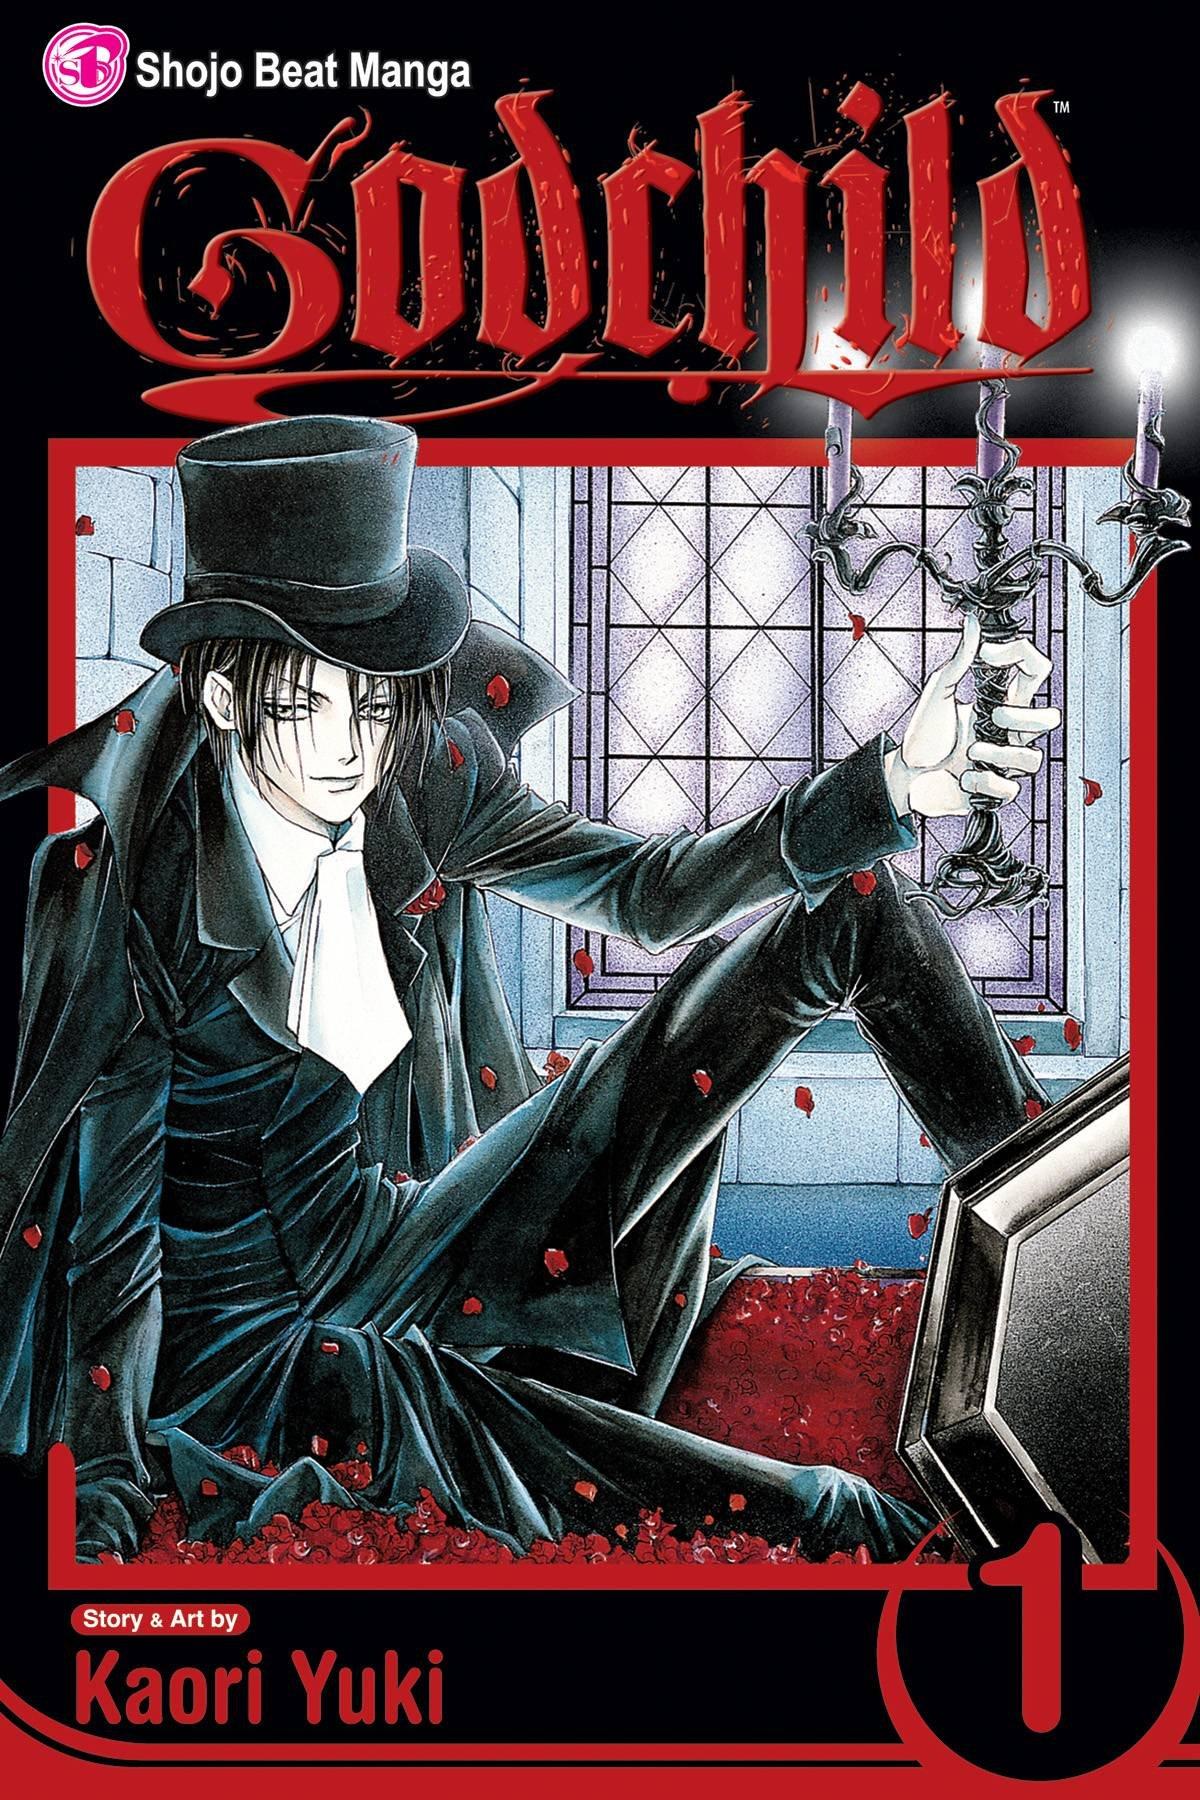 Godchild, Vol. 1, Yuki, Kaori